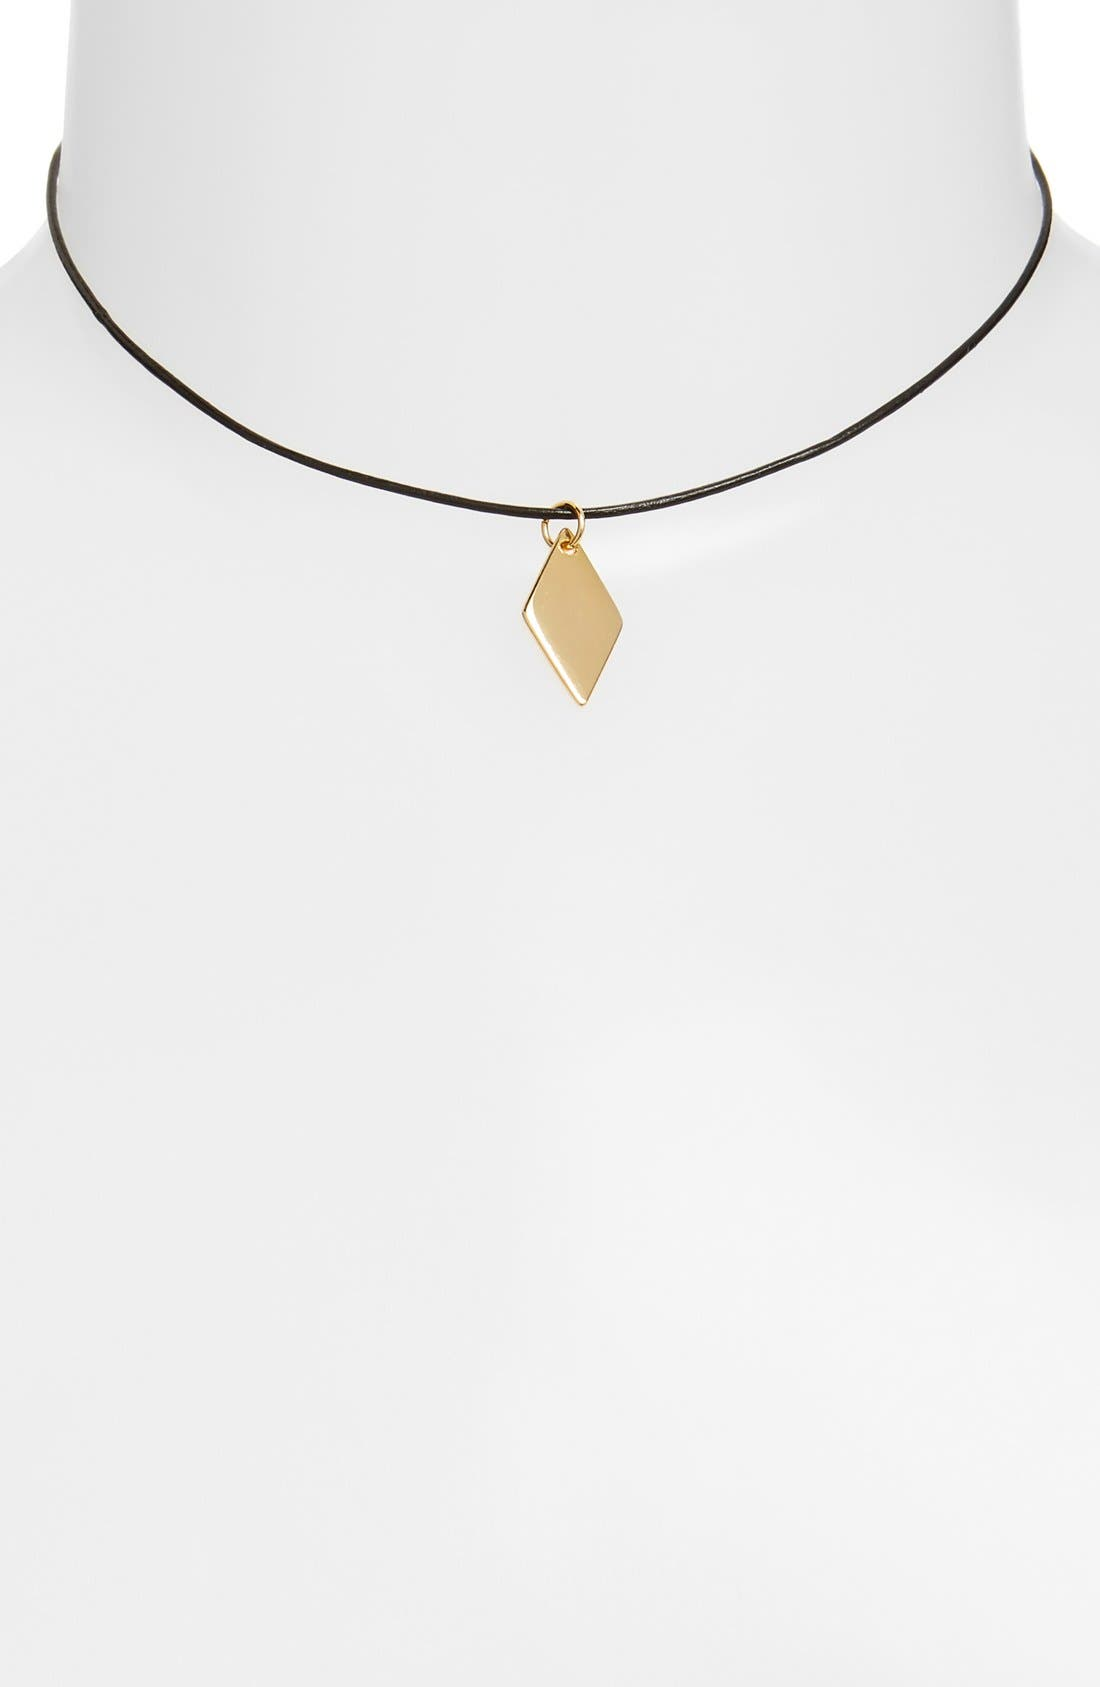 Main Image - Vanessa Mooney Geometric Charm Leather Choker